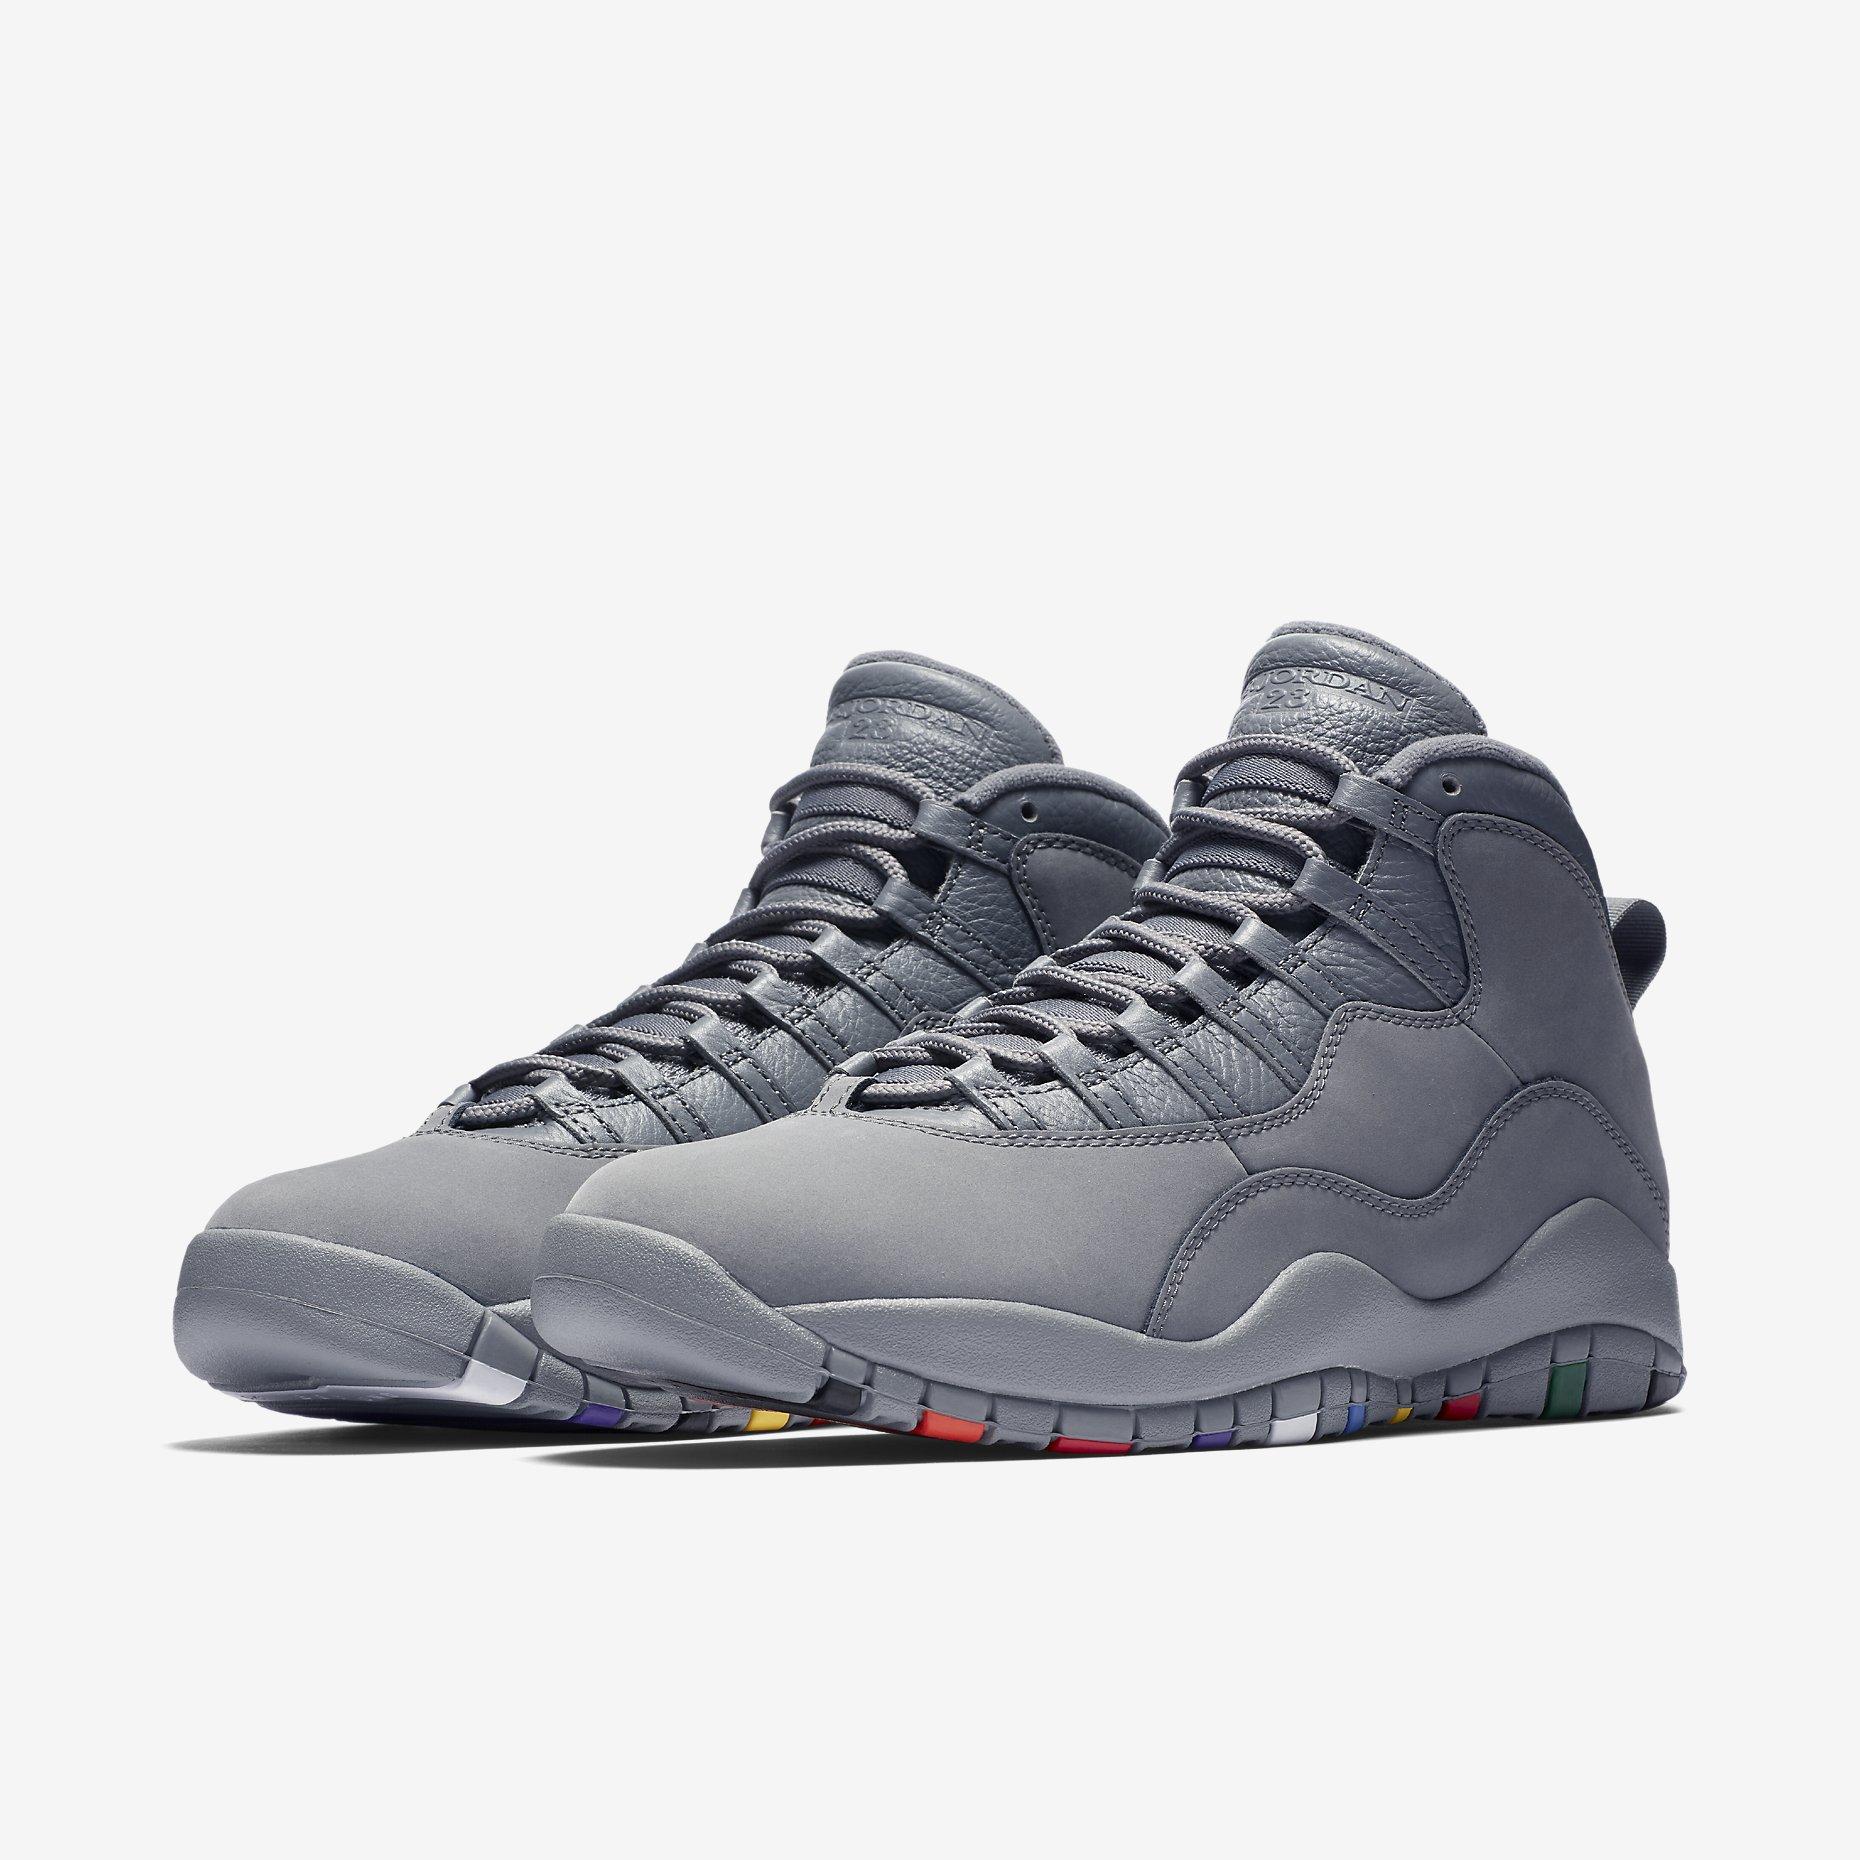 Air Jordan 9 Retro Cool Grey